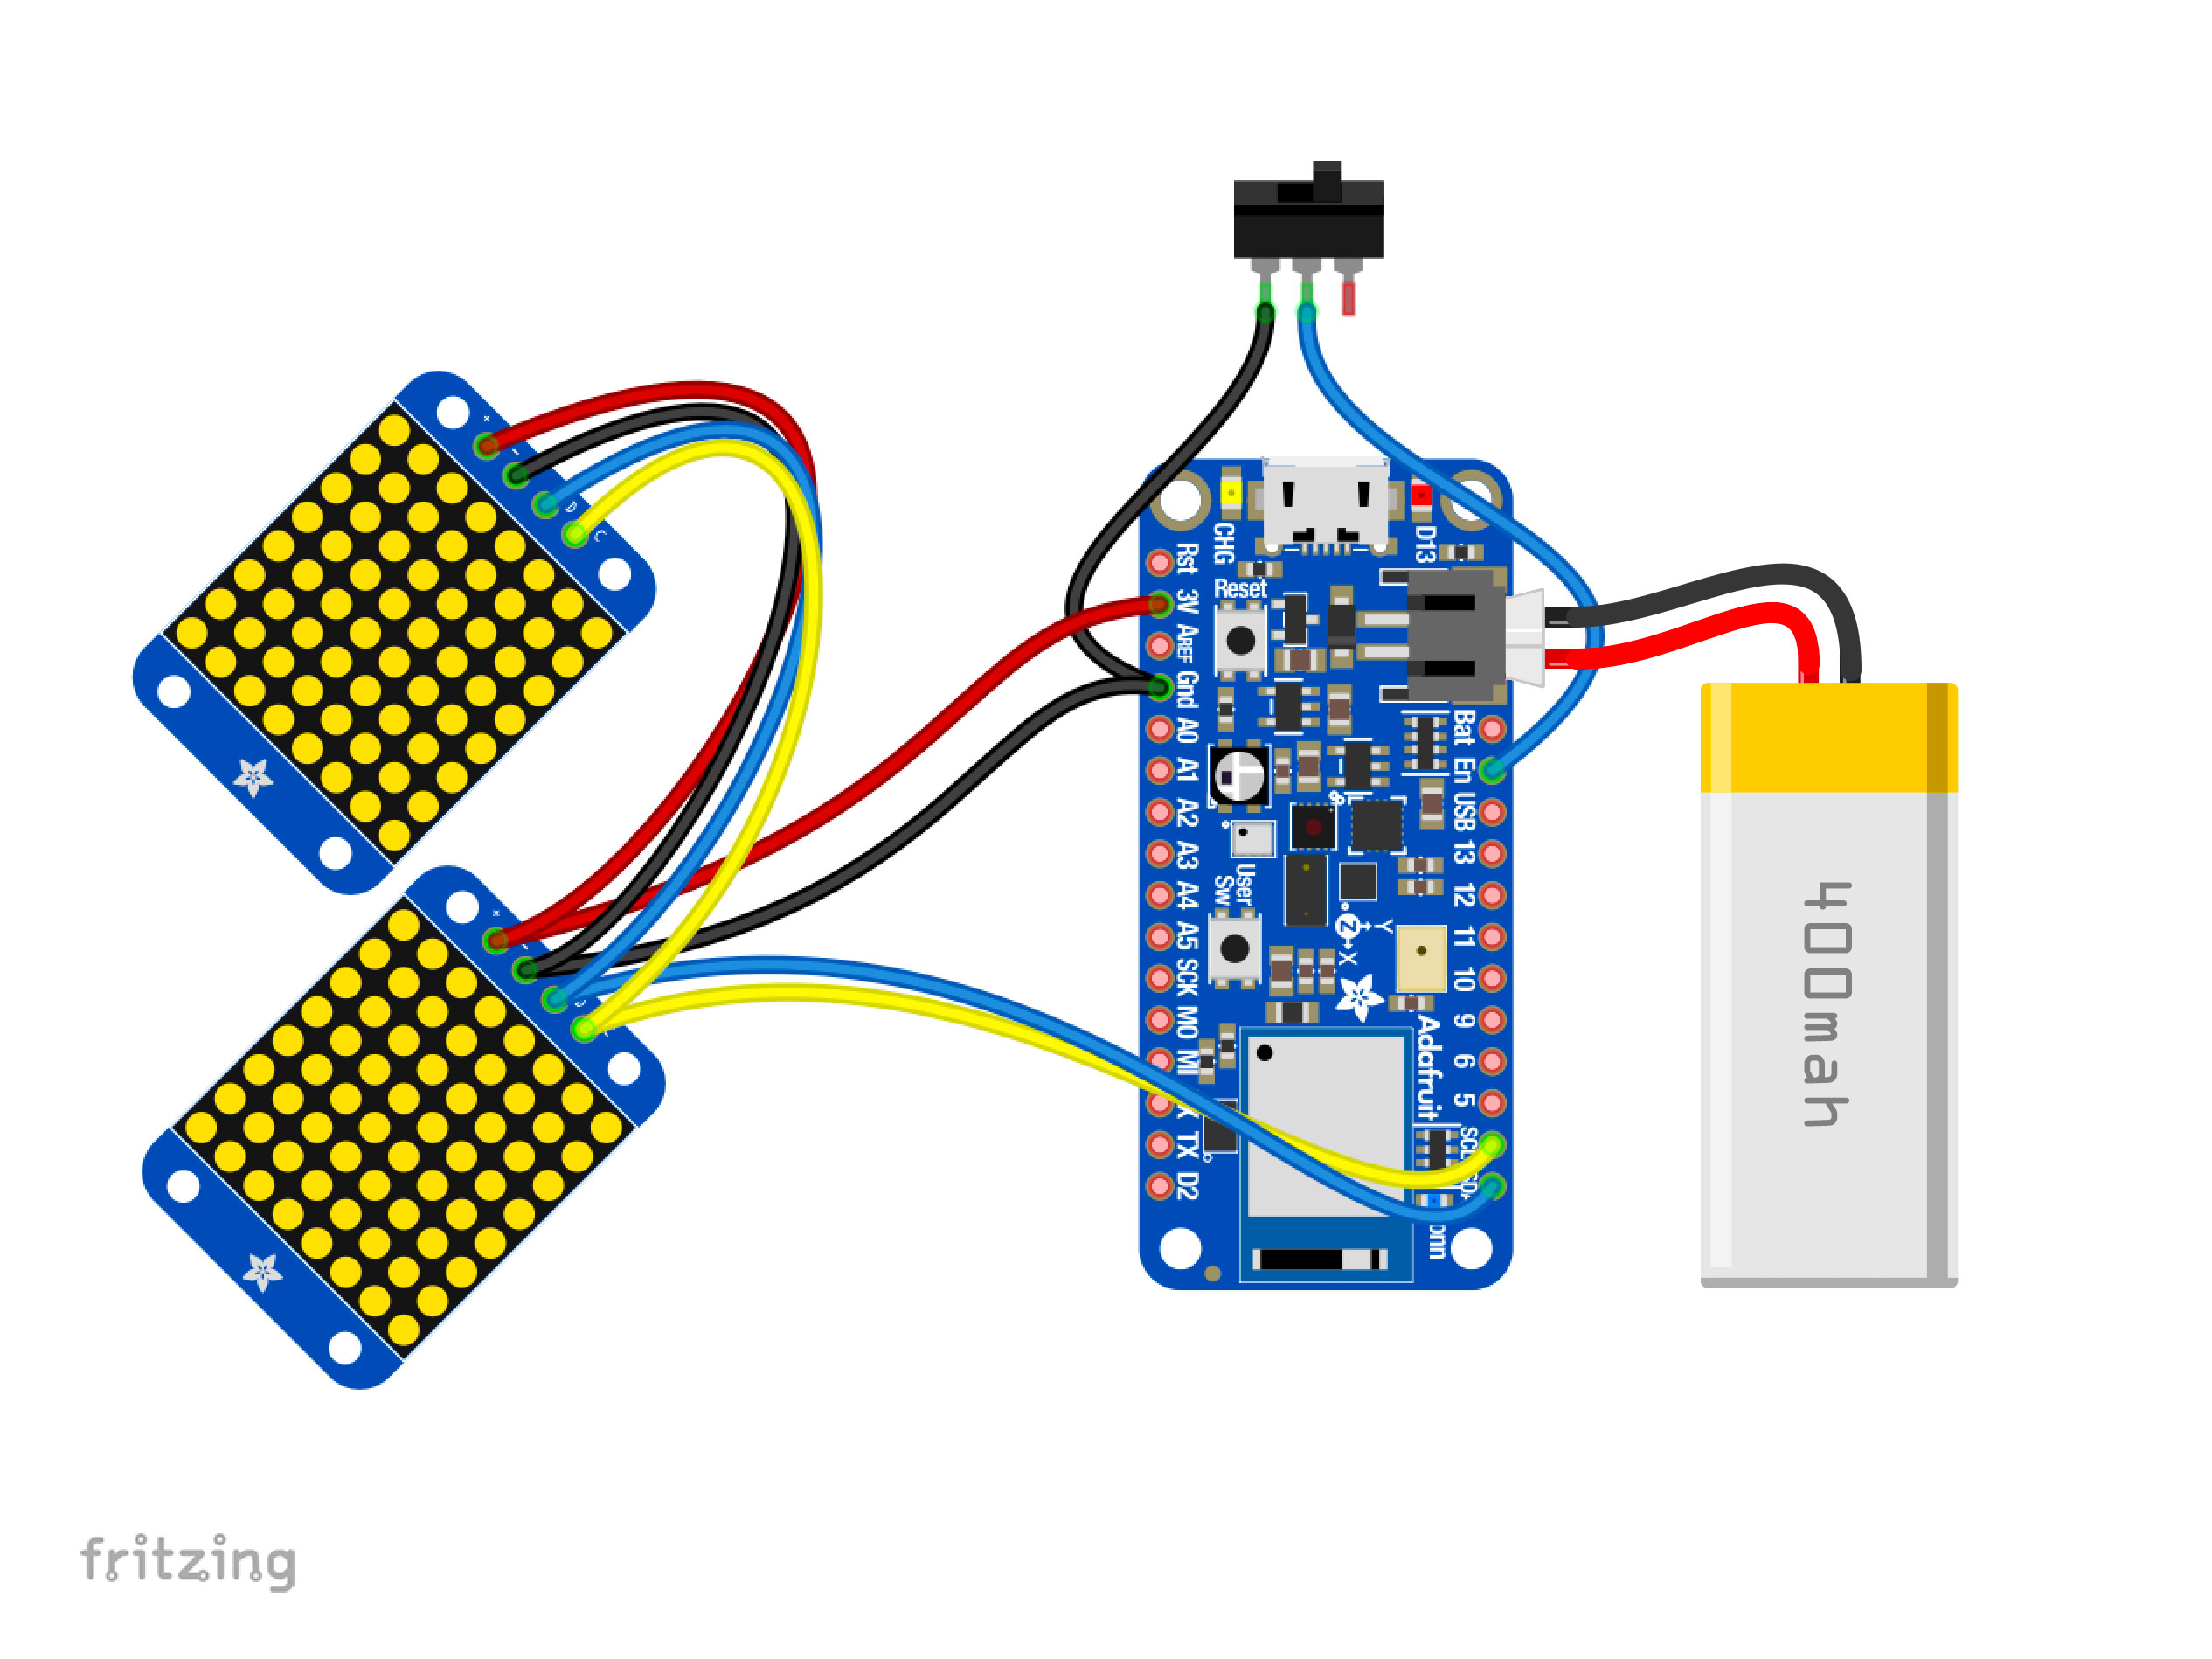 led_matrices_circuit-diagram.jpg